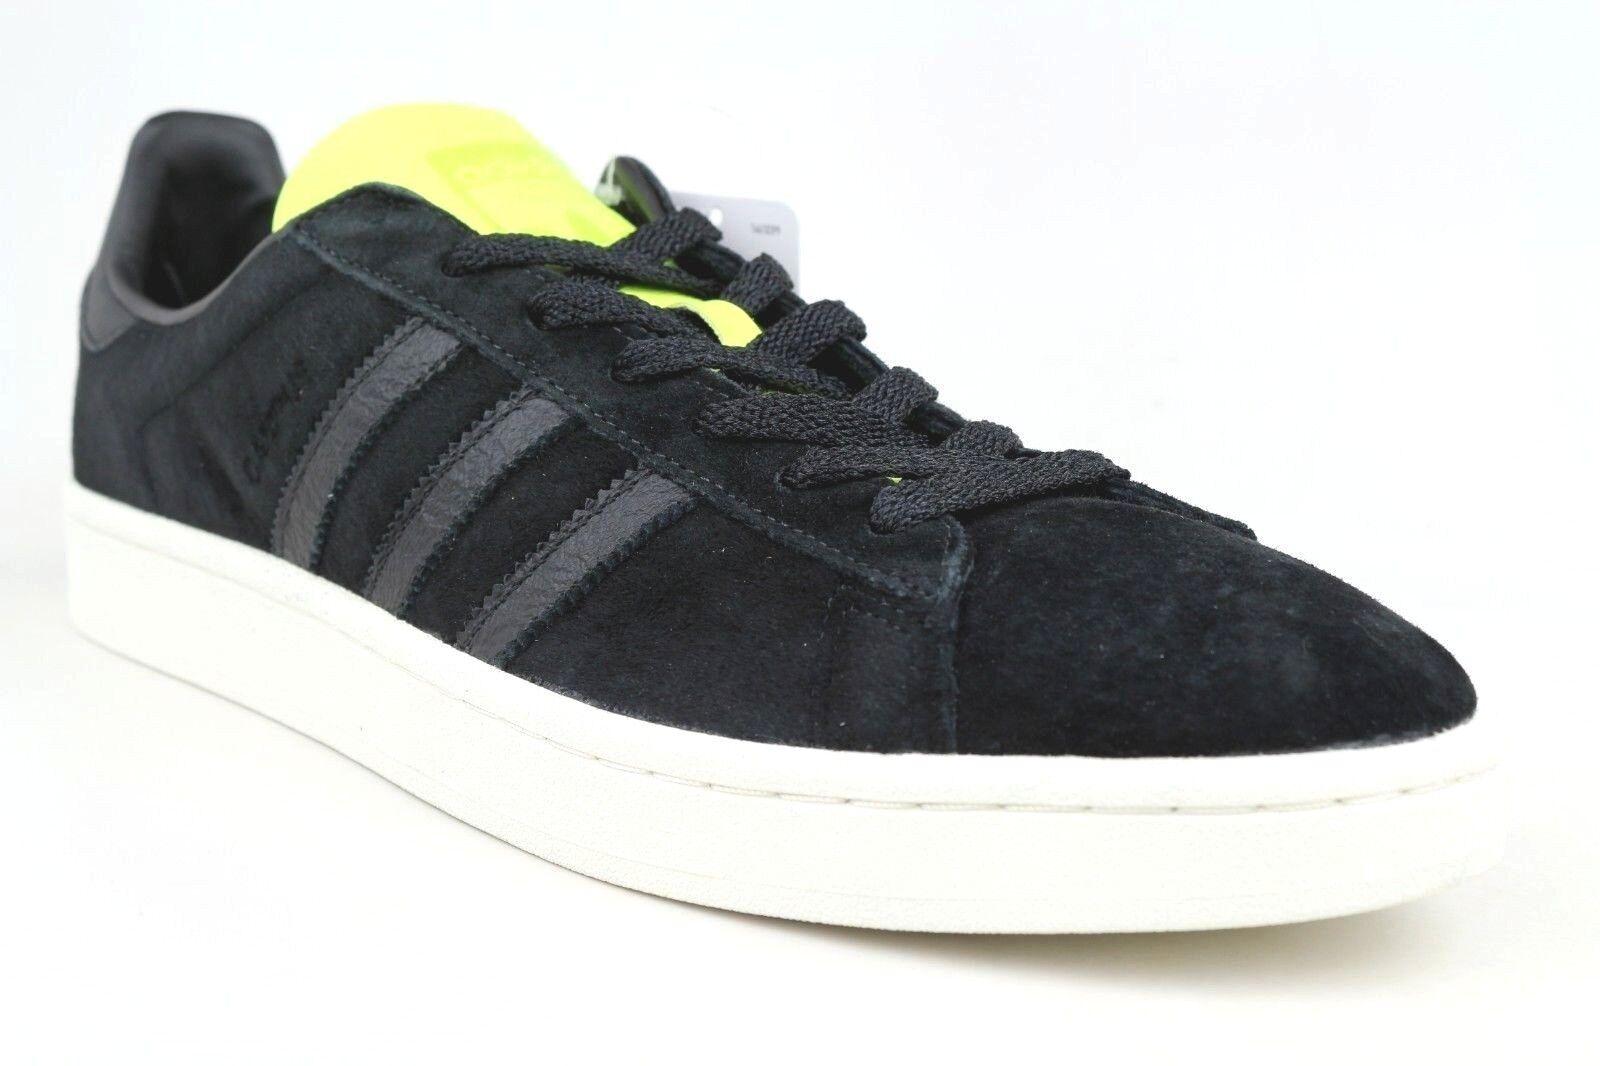 Men's Adidas Originals Campus Sneakers Black/Neon Yellow Shoes Size 9 BB0082